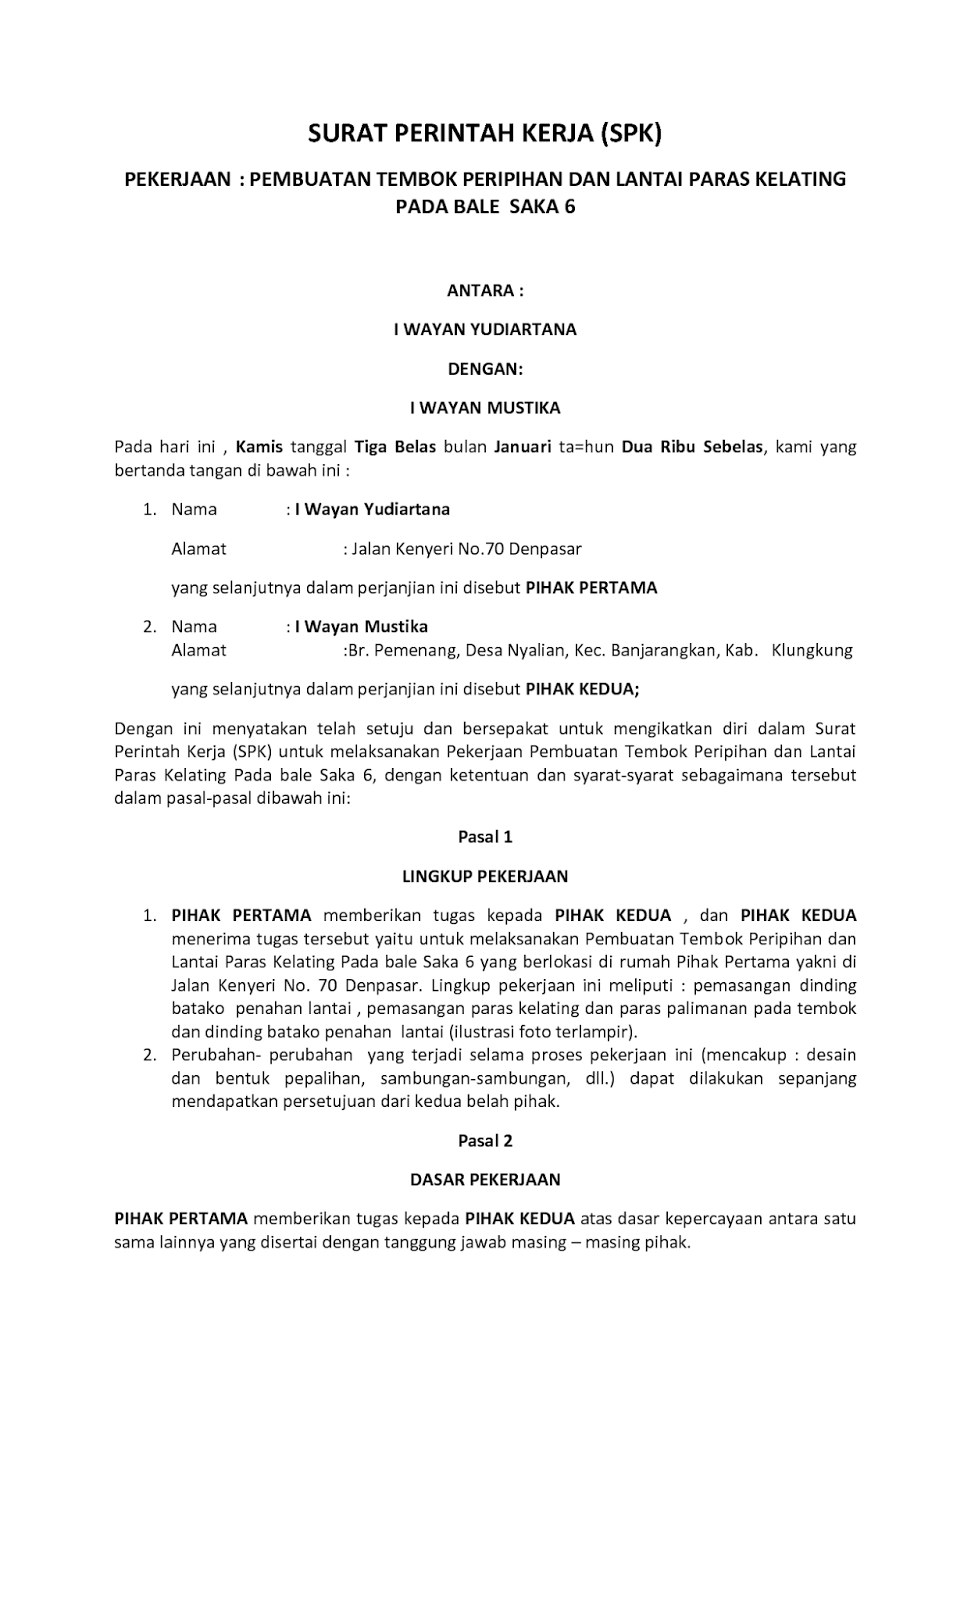 Pengertian Dan Contoh Surat Perintah 2019 Januari 2019 Pendaftaran